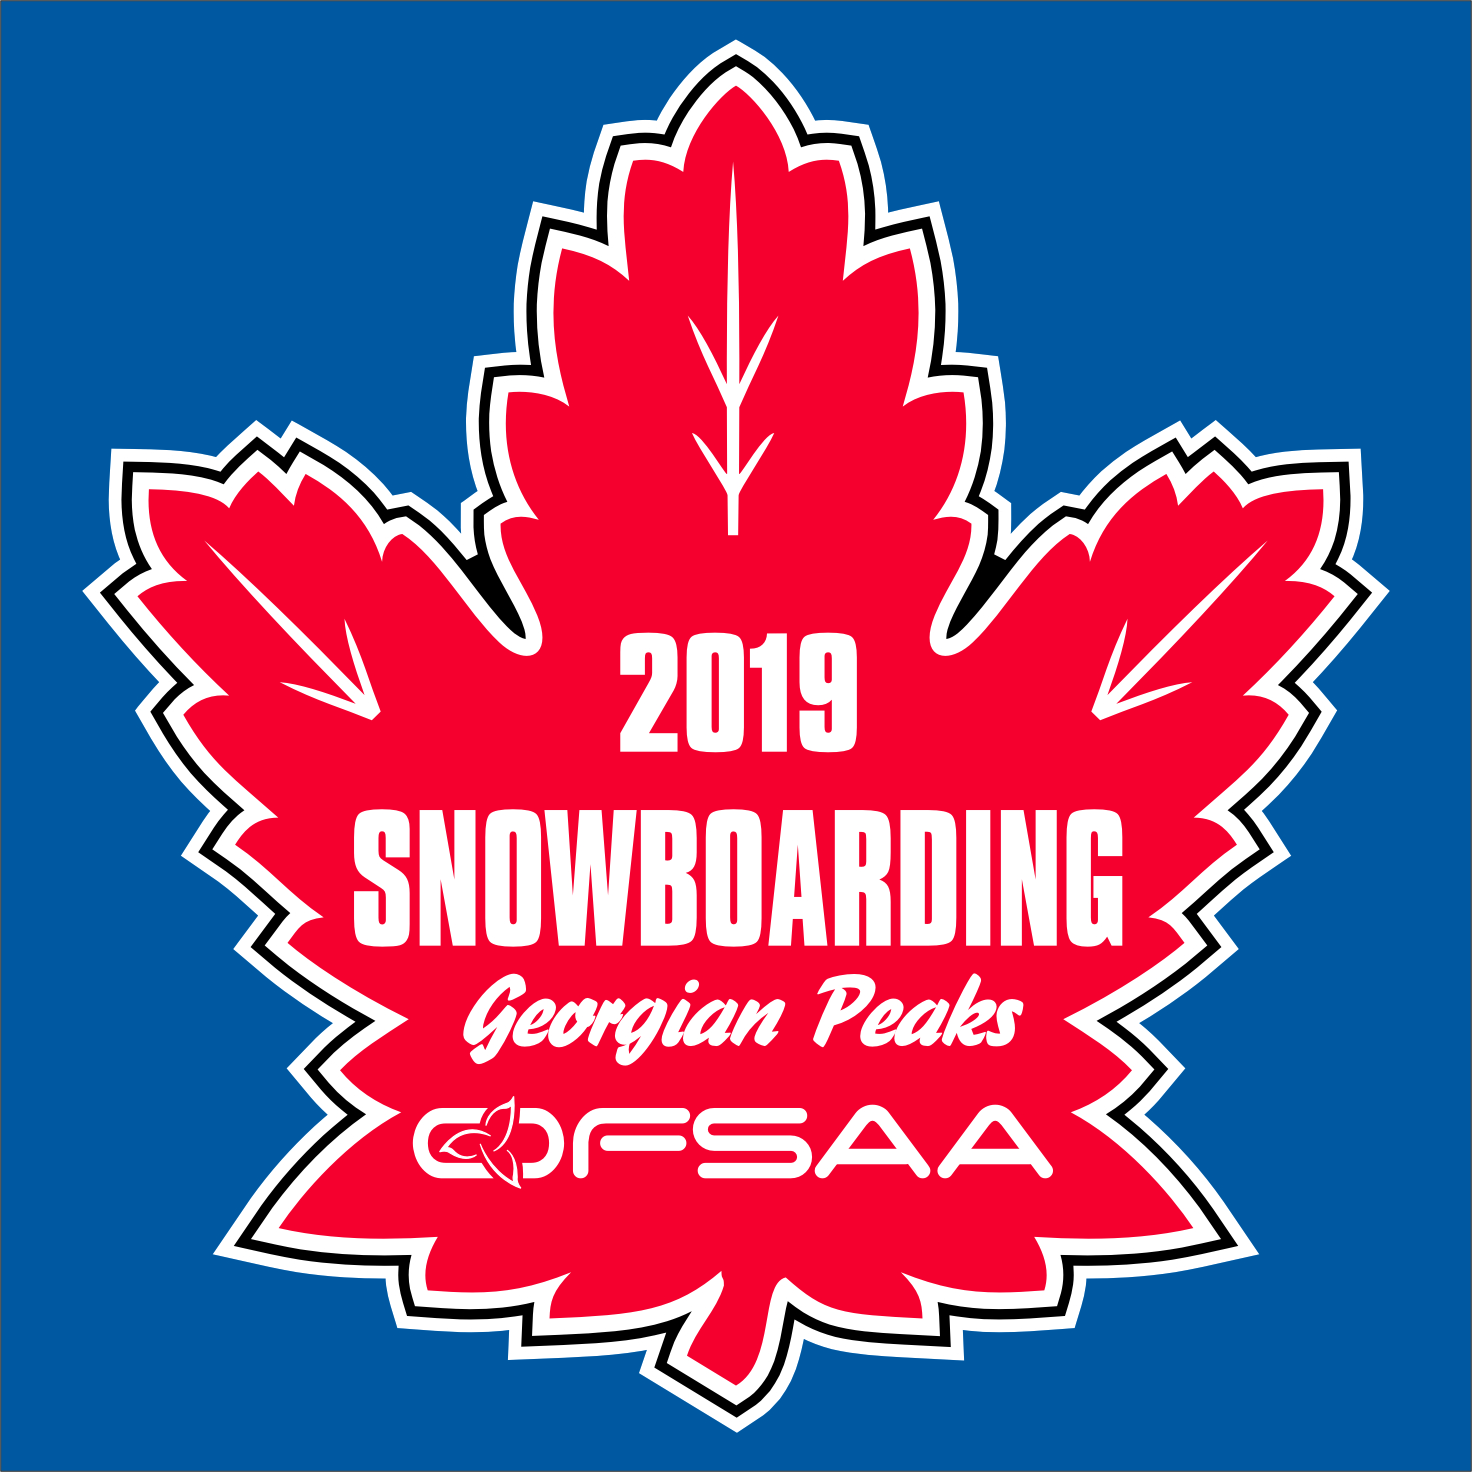 2019 Snowboarding logo blueg.jpg